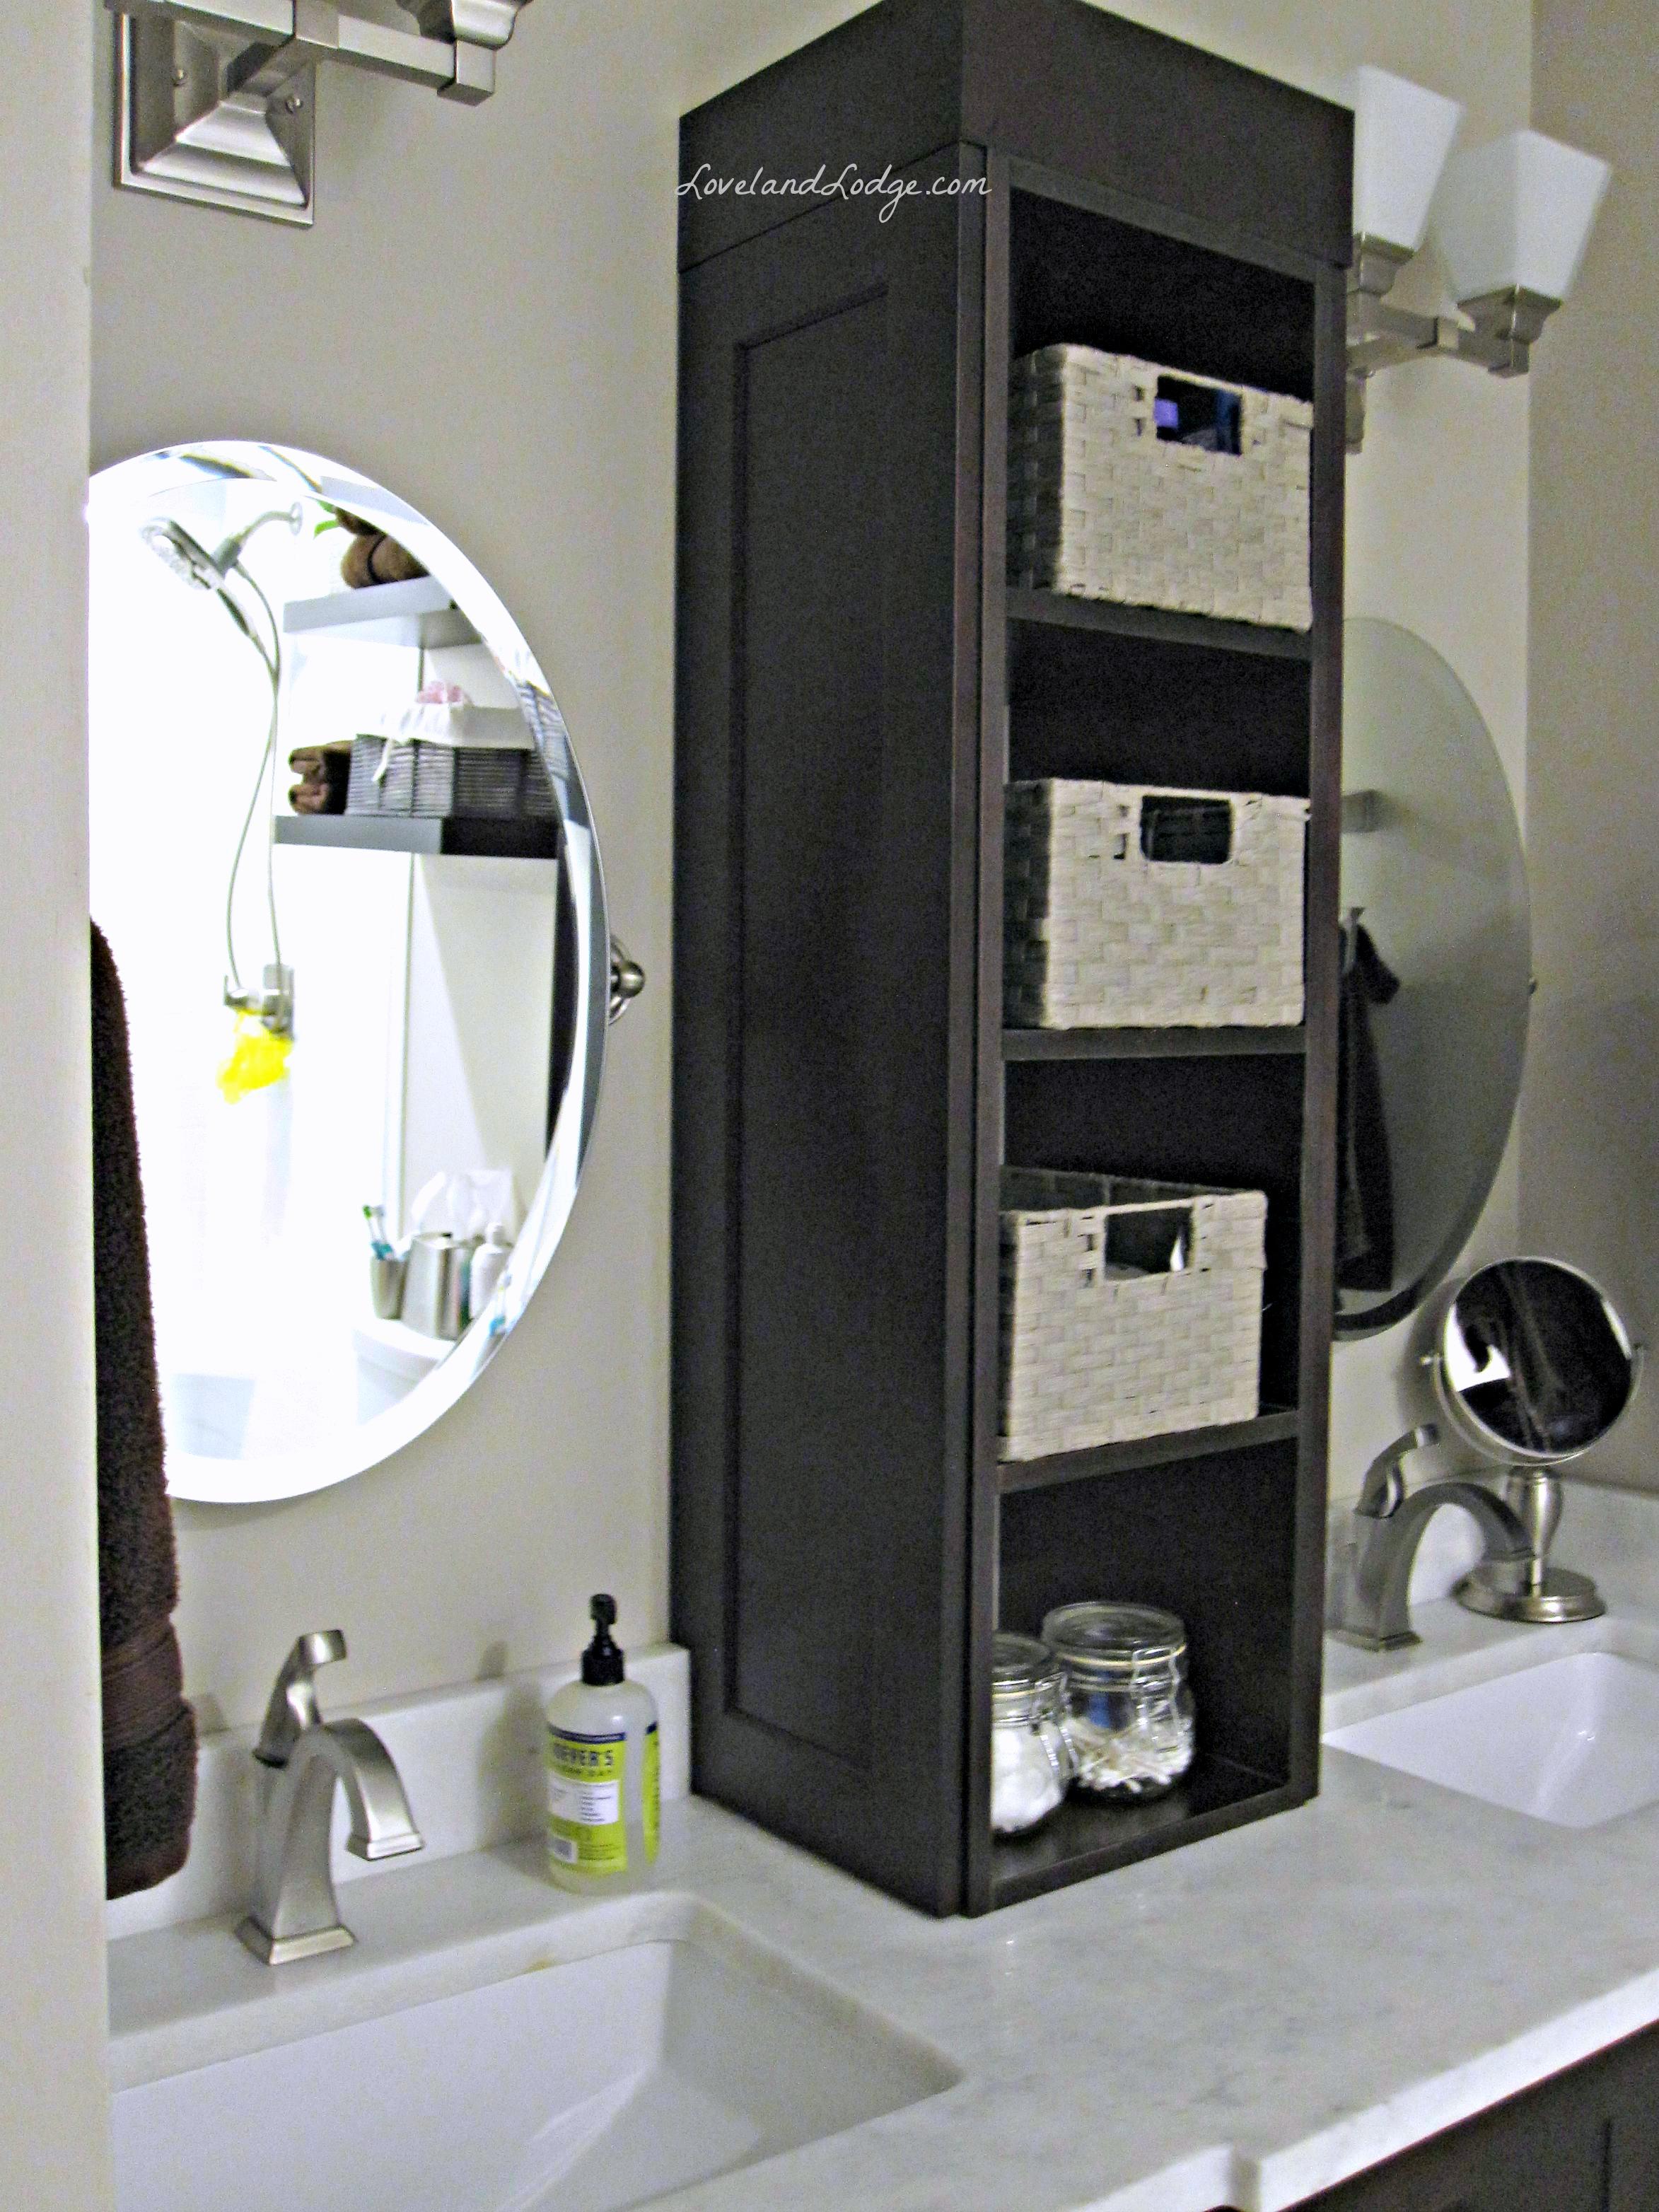 Master Bathroom Reveal: Master Bathroom Renovation Reveal